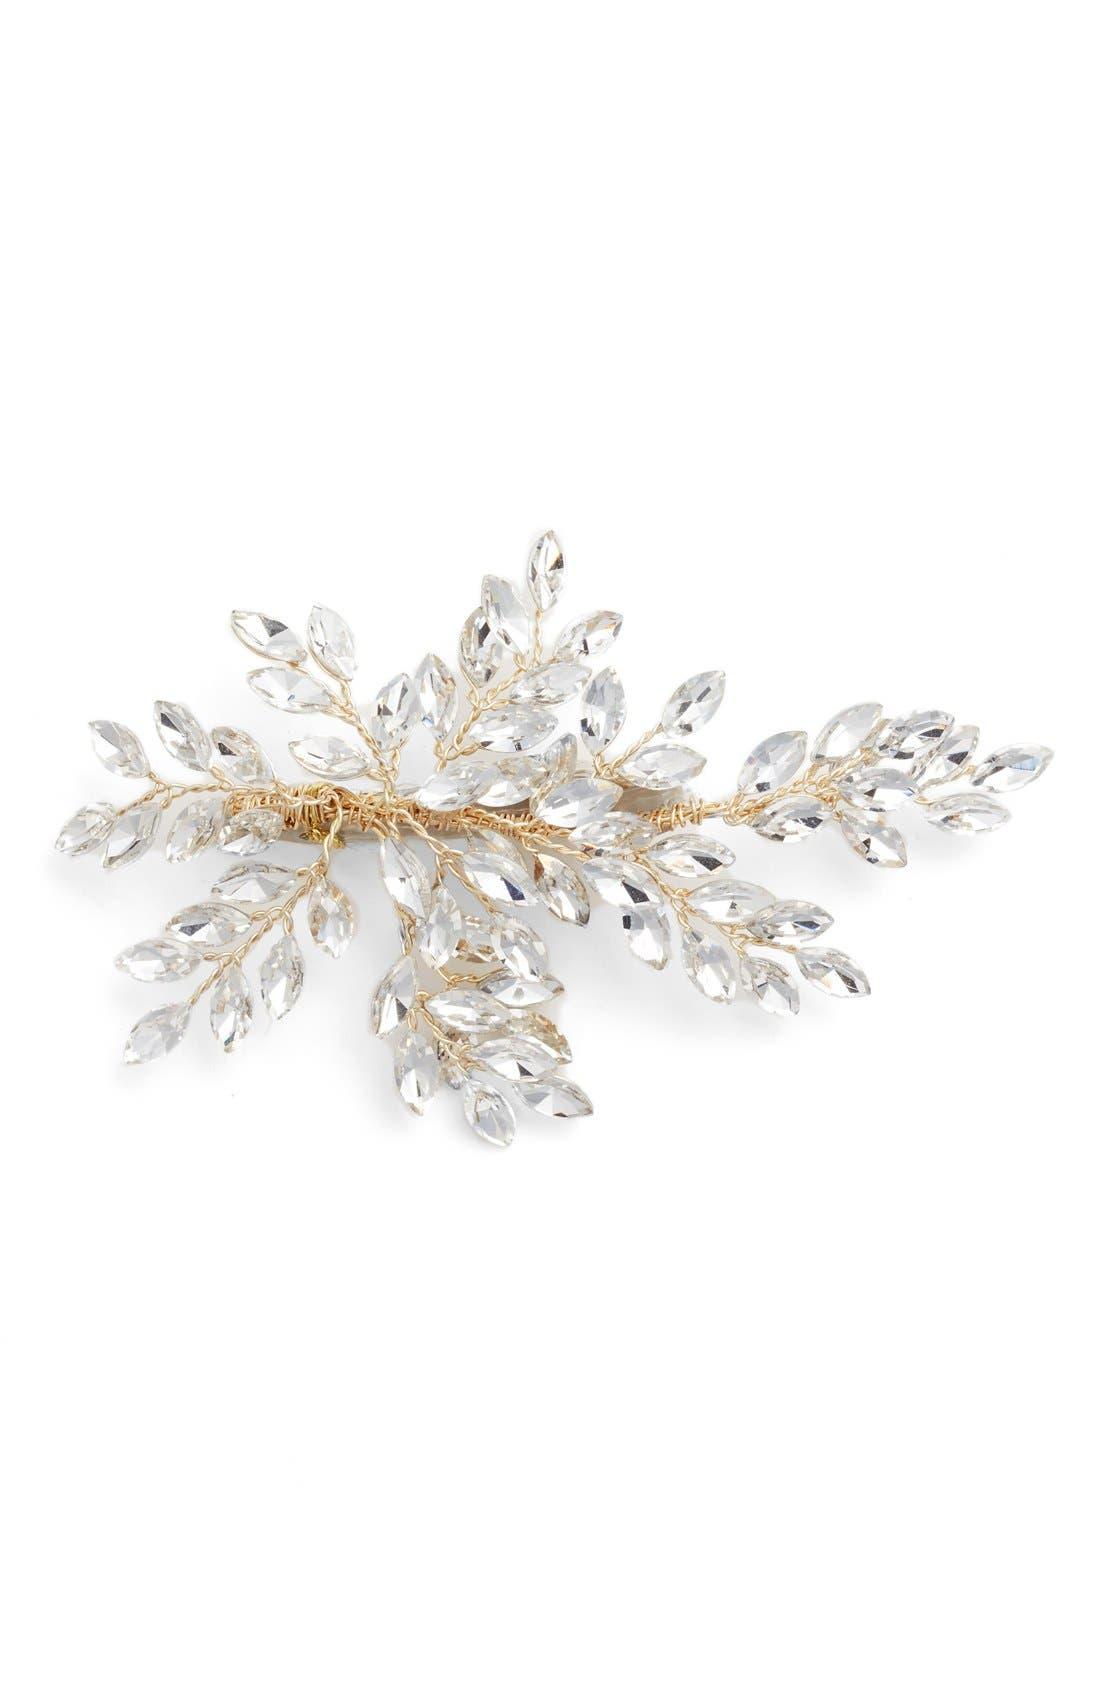 BRIDES & HAIRPINS 'Sahara' Crystal Leaf Bendable Hair Clip, Main, color, GOLD